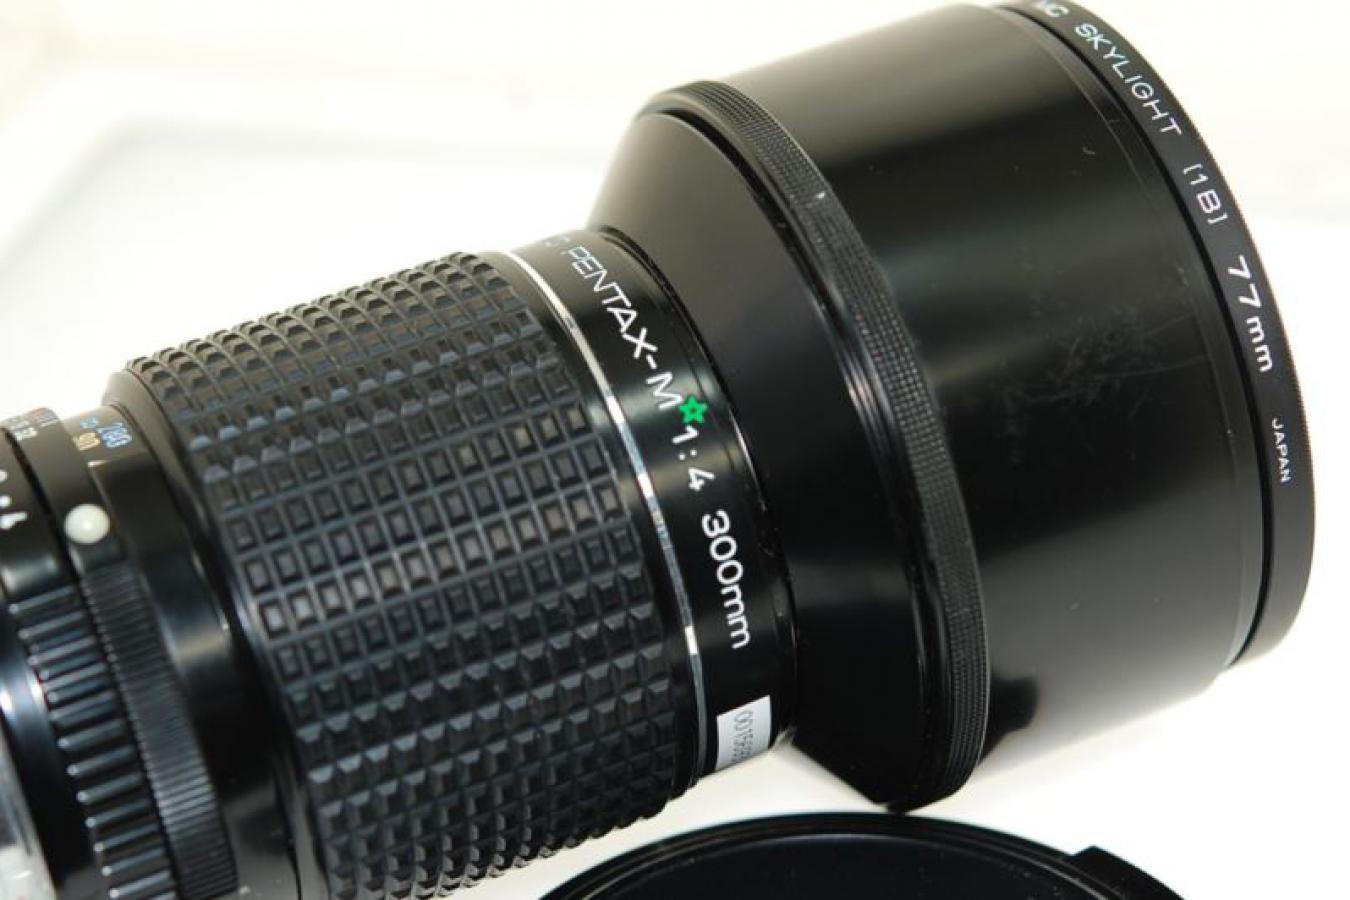 SMC PENTAX-M ☆ 300mm F4 【ケンコー製77mmMCスカイライトフィルター付】